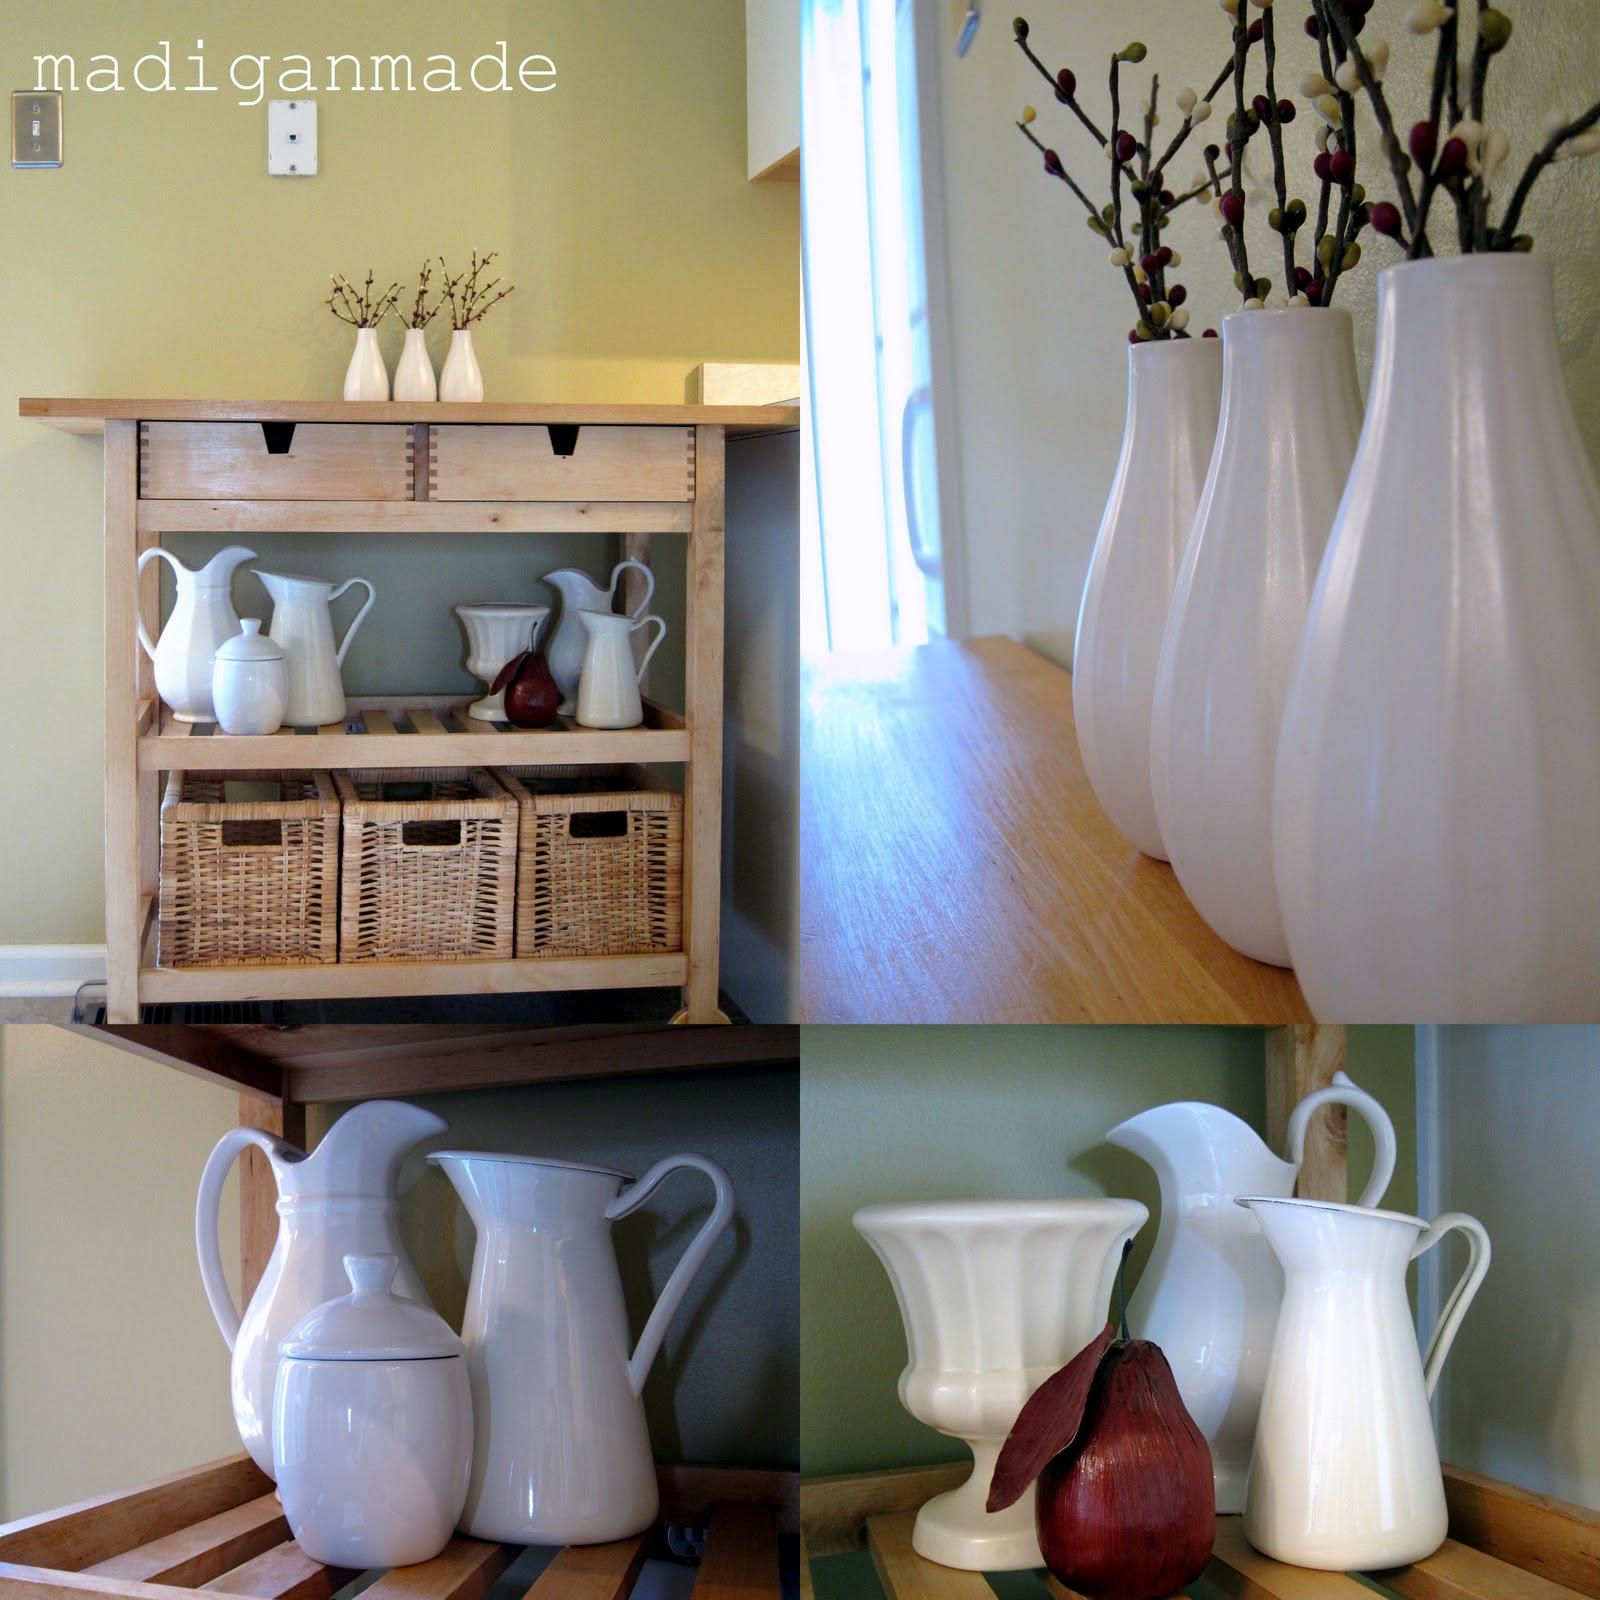 http://4.bp.blogspot.com/_xd5aEjCcjL4/TSCerHj51mI/AAAAAAAABVY/1UmOjYhWb7w/s1600/pottery.jpg